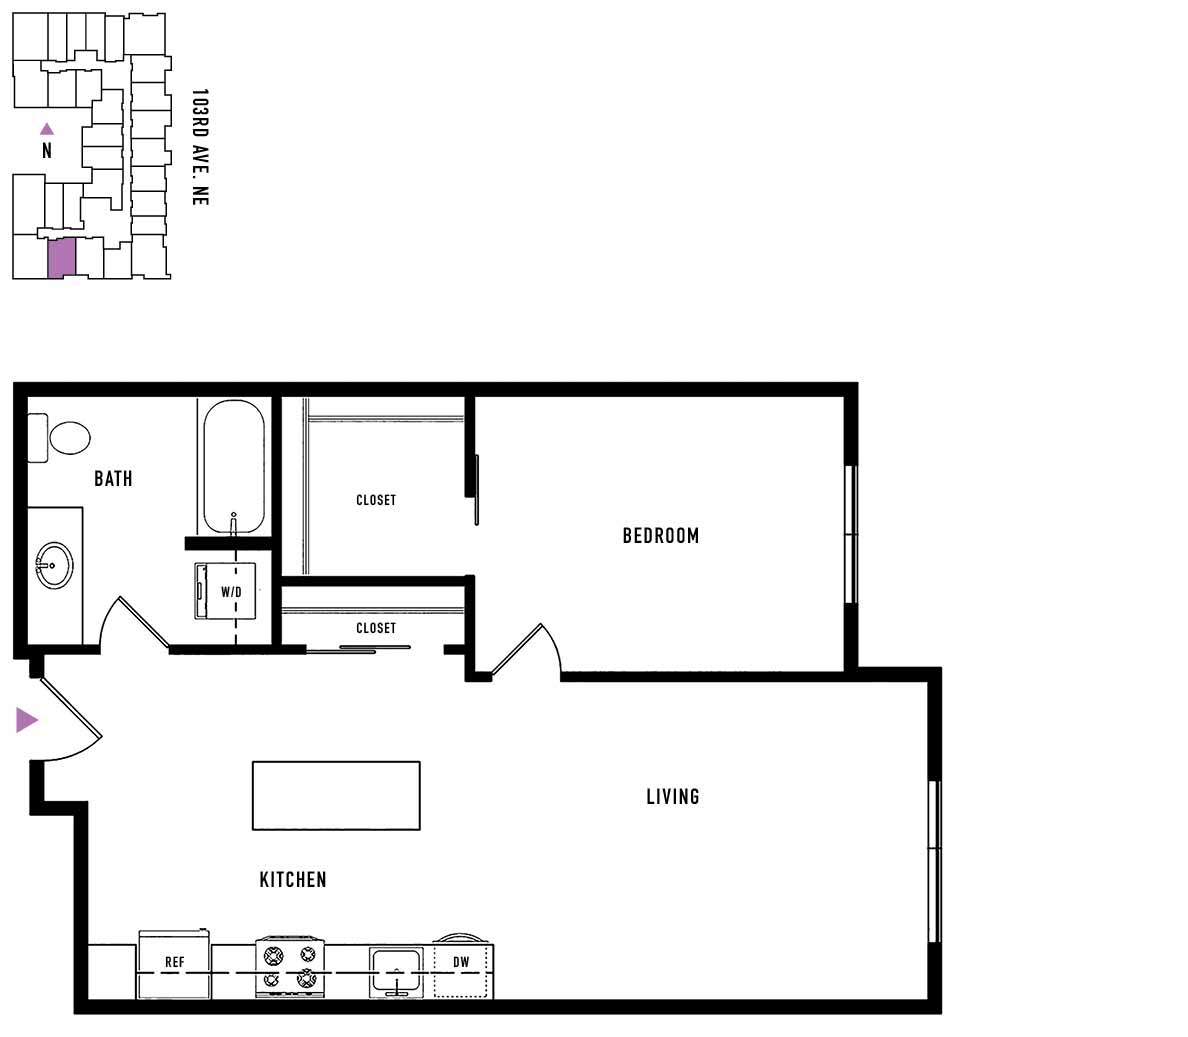 Mira_Flats_floorplans_final_white_2019_web11.jpg